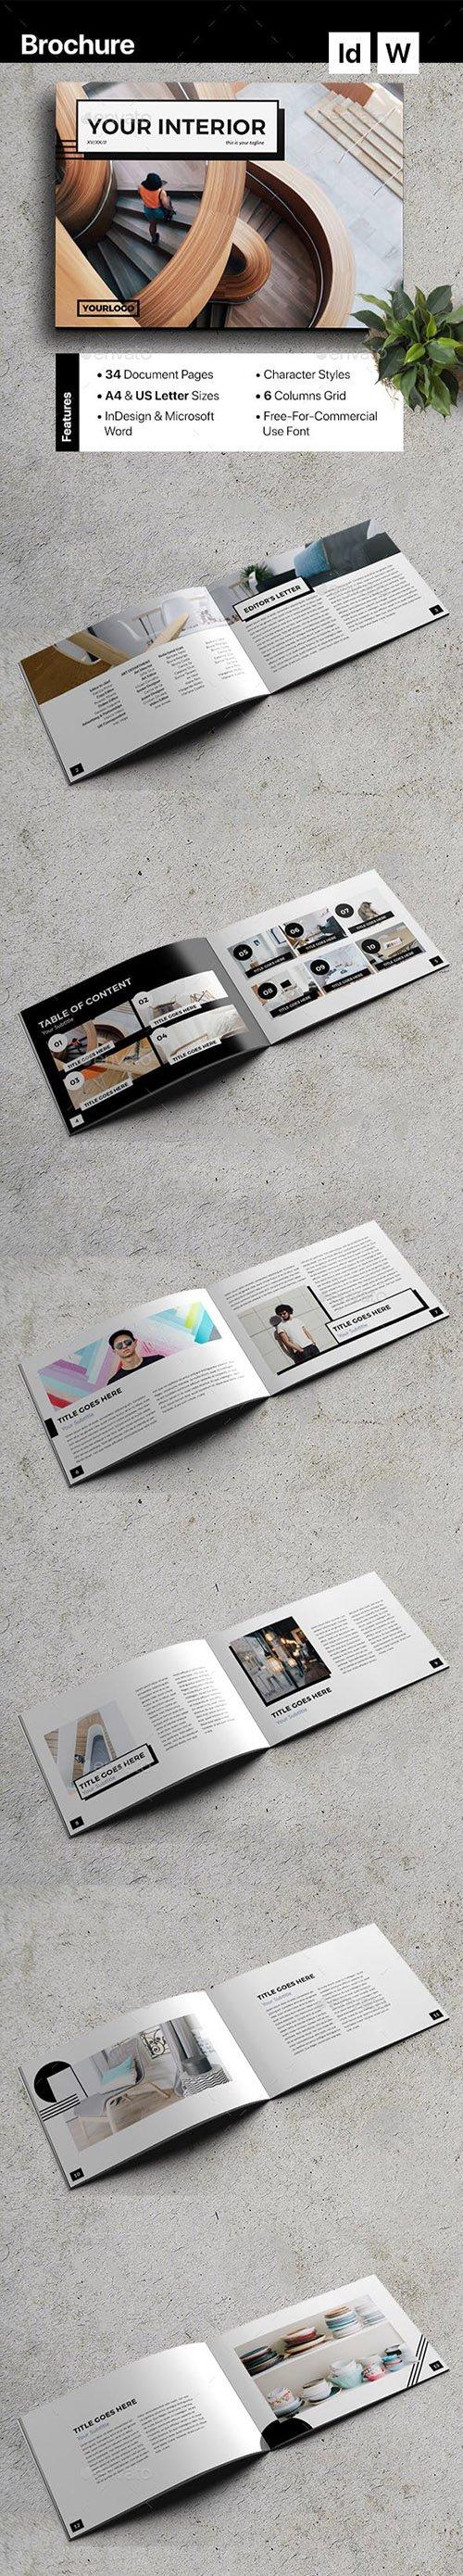 GR - Brochure 19937357